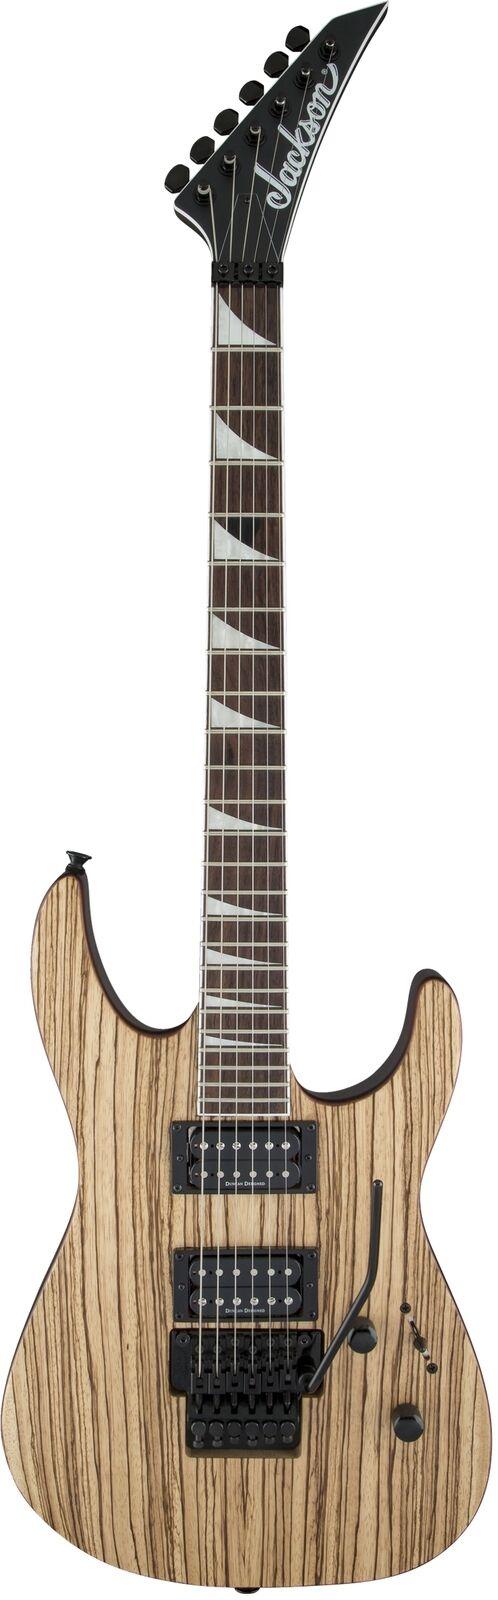 Jackson SLX - Zebra Wood - X Series Solist